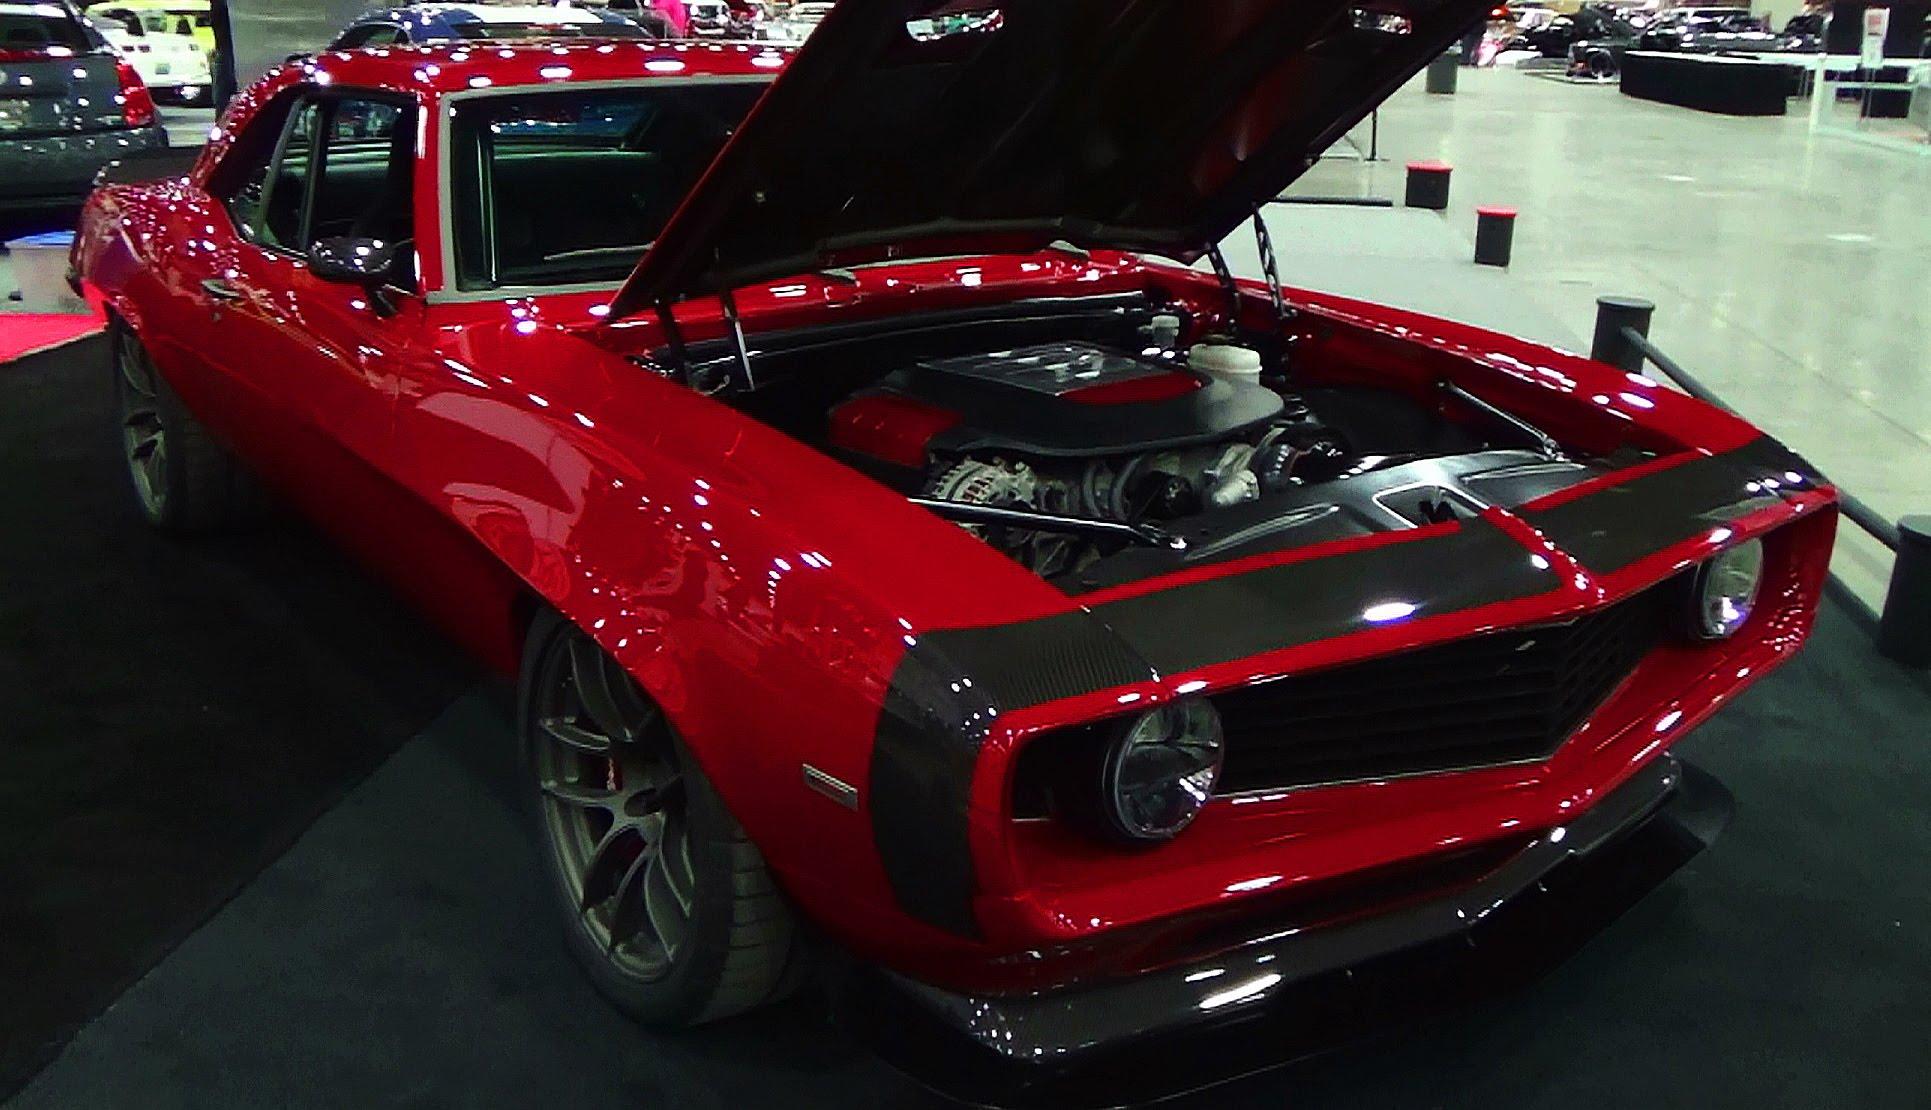 69 Camaro Hellfire Detroit Autorama 2015